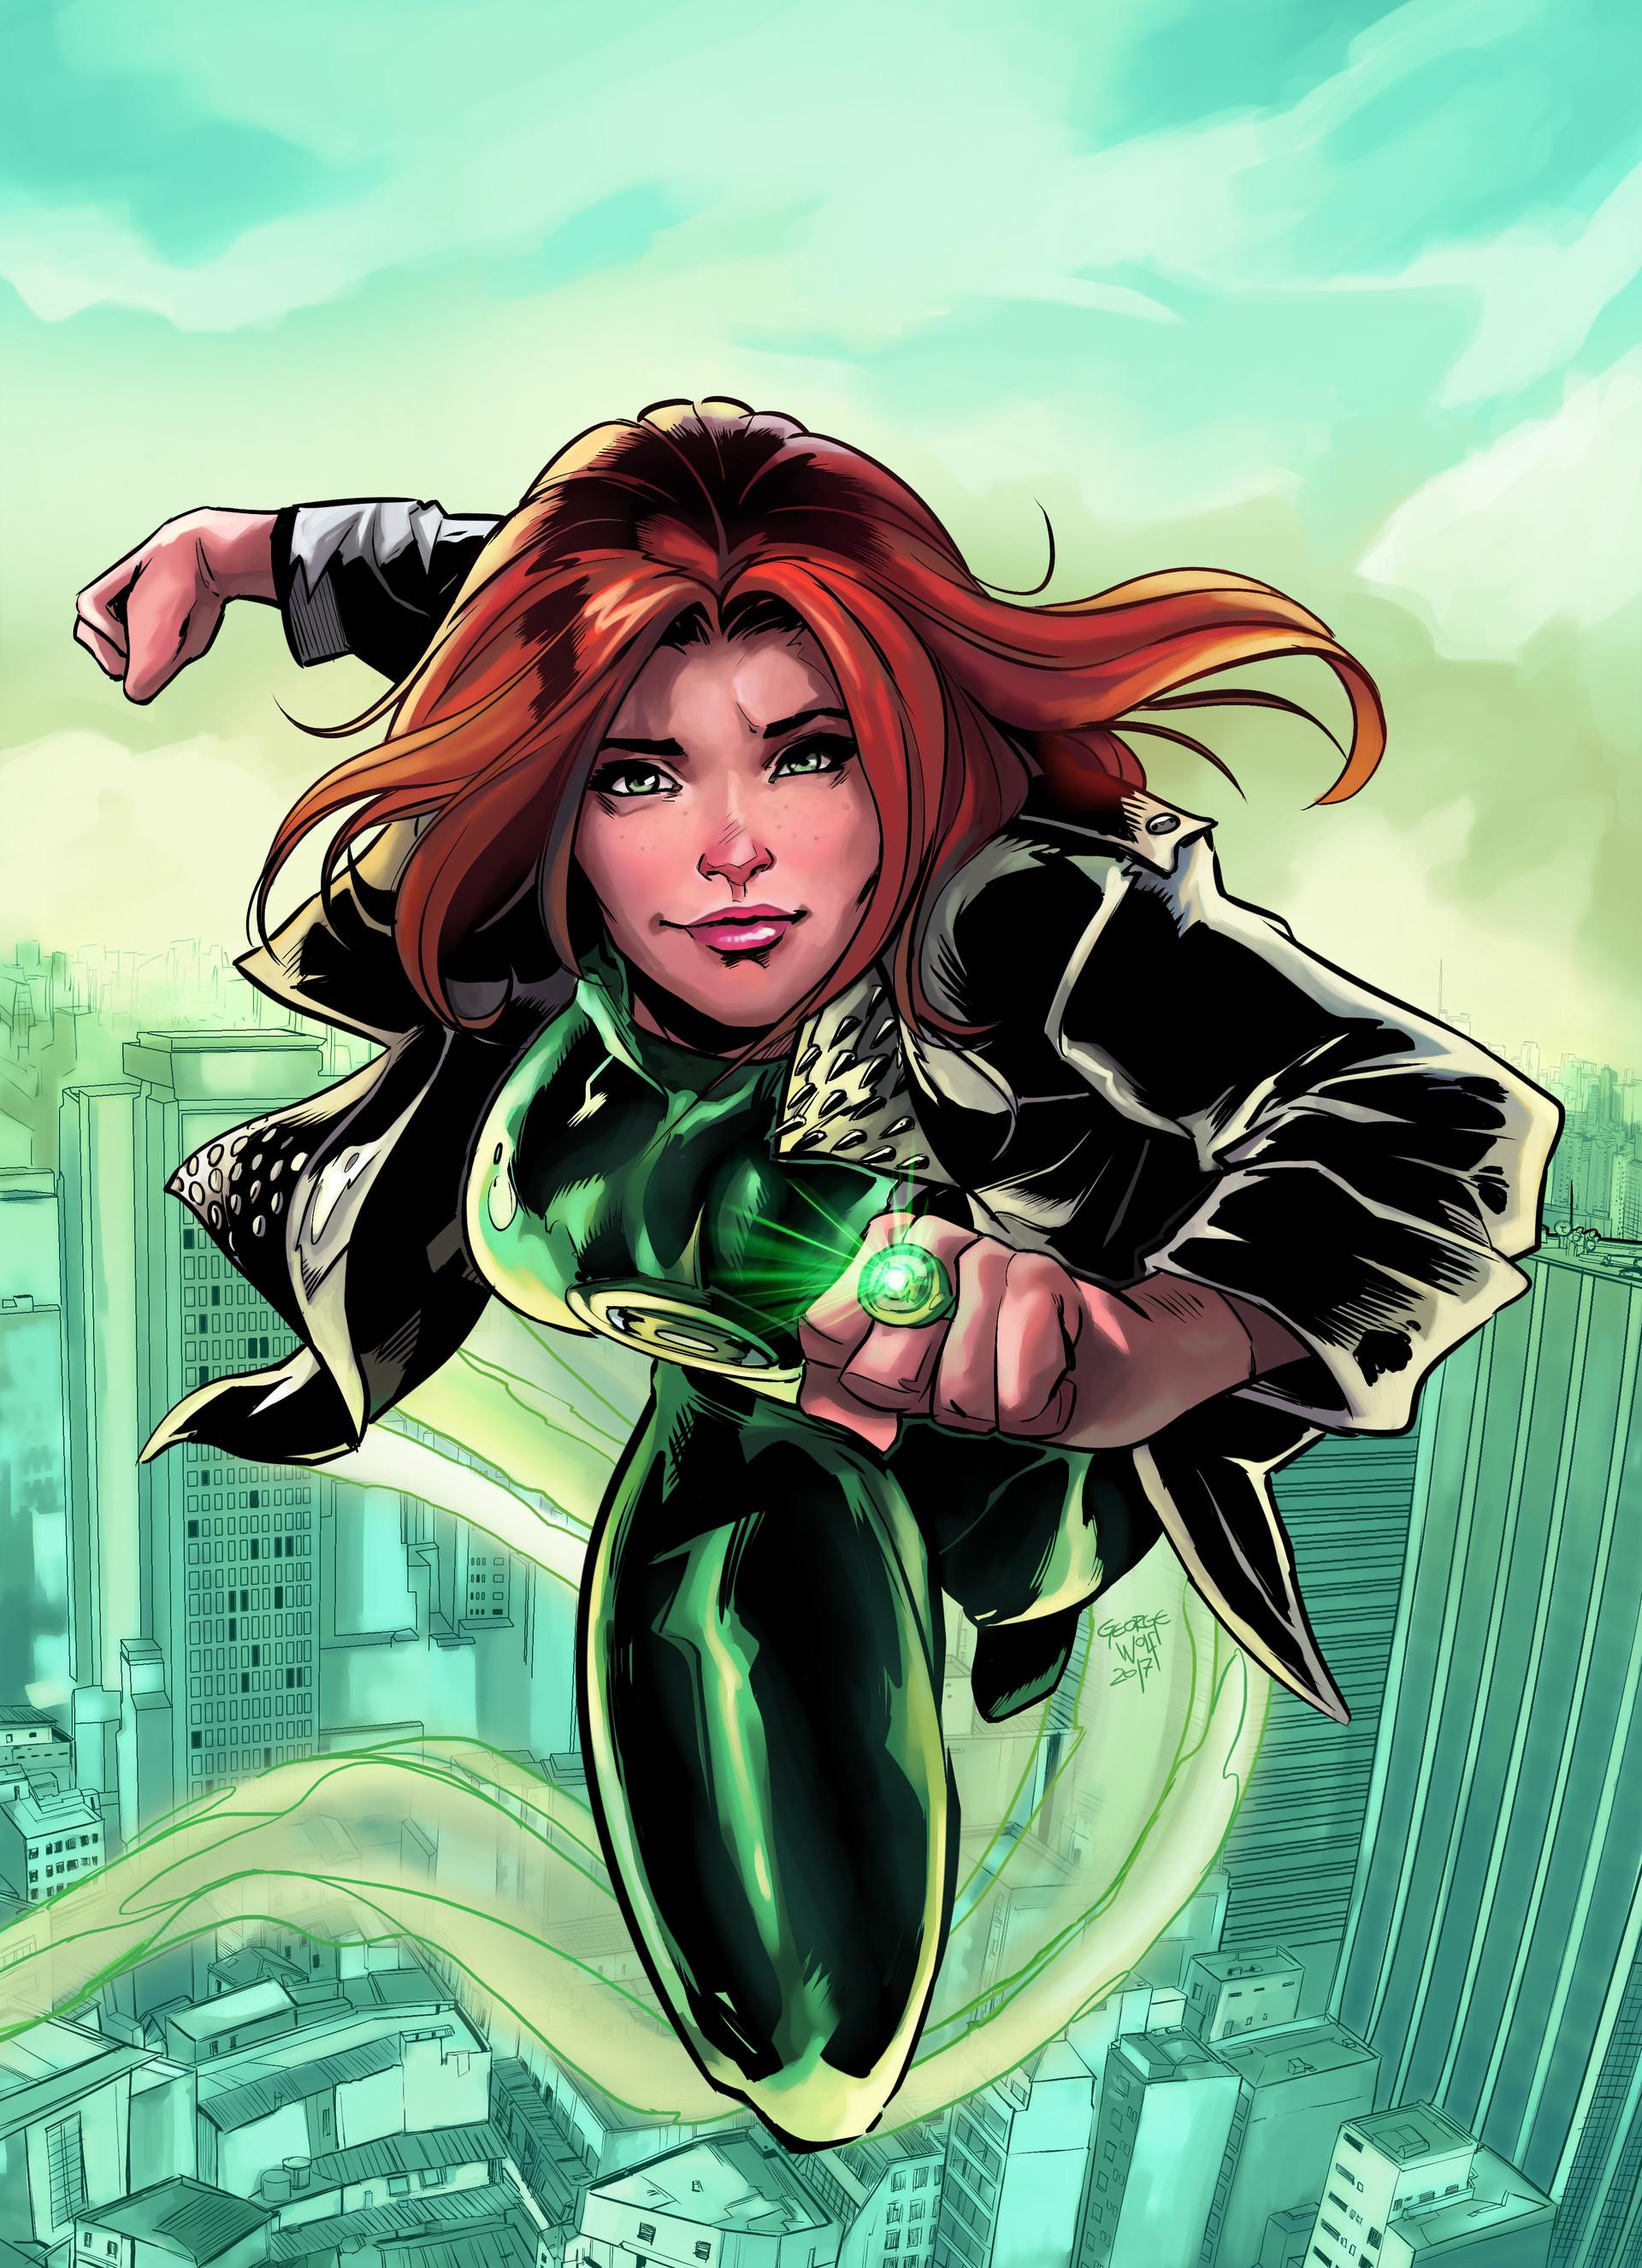 Artstation - Girl Green Lantern George Wolf